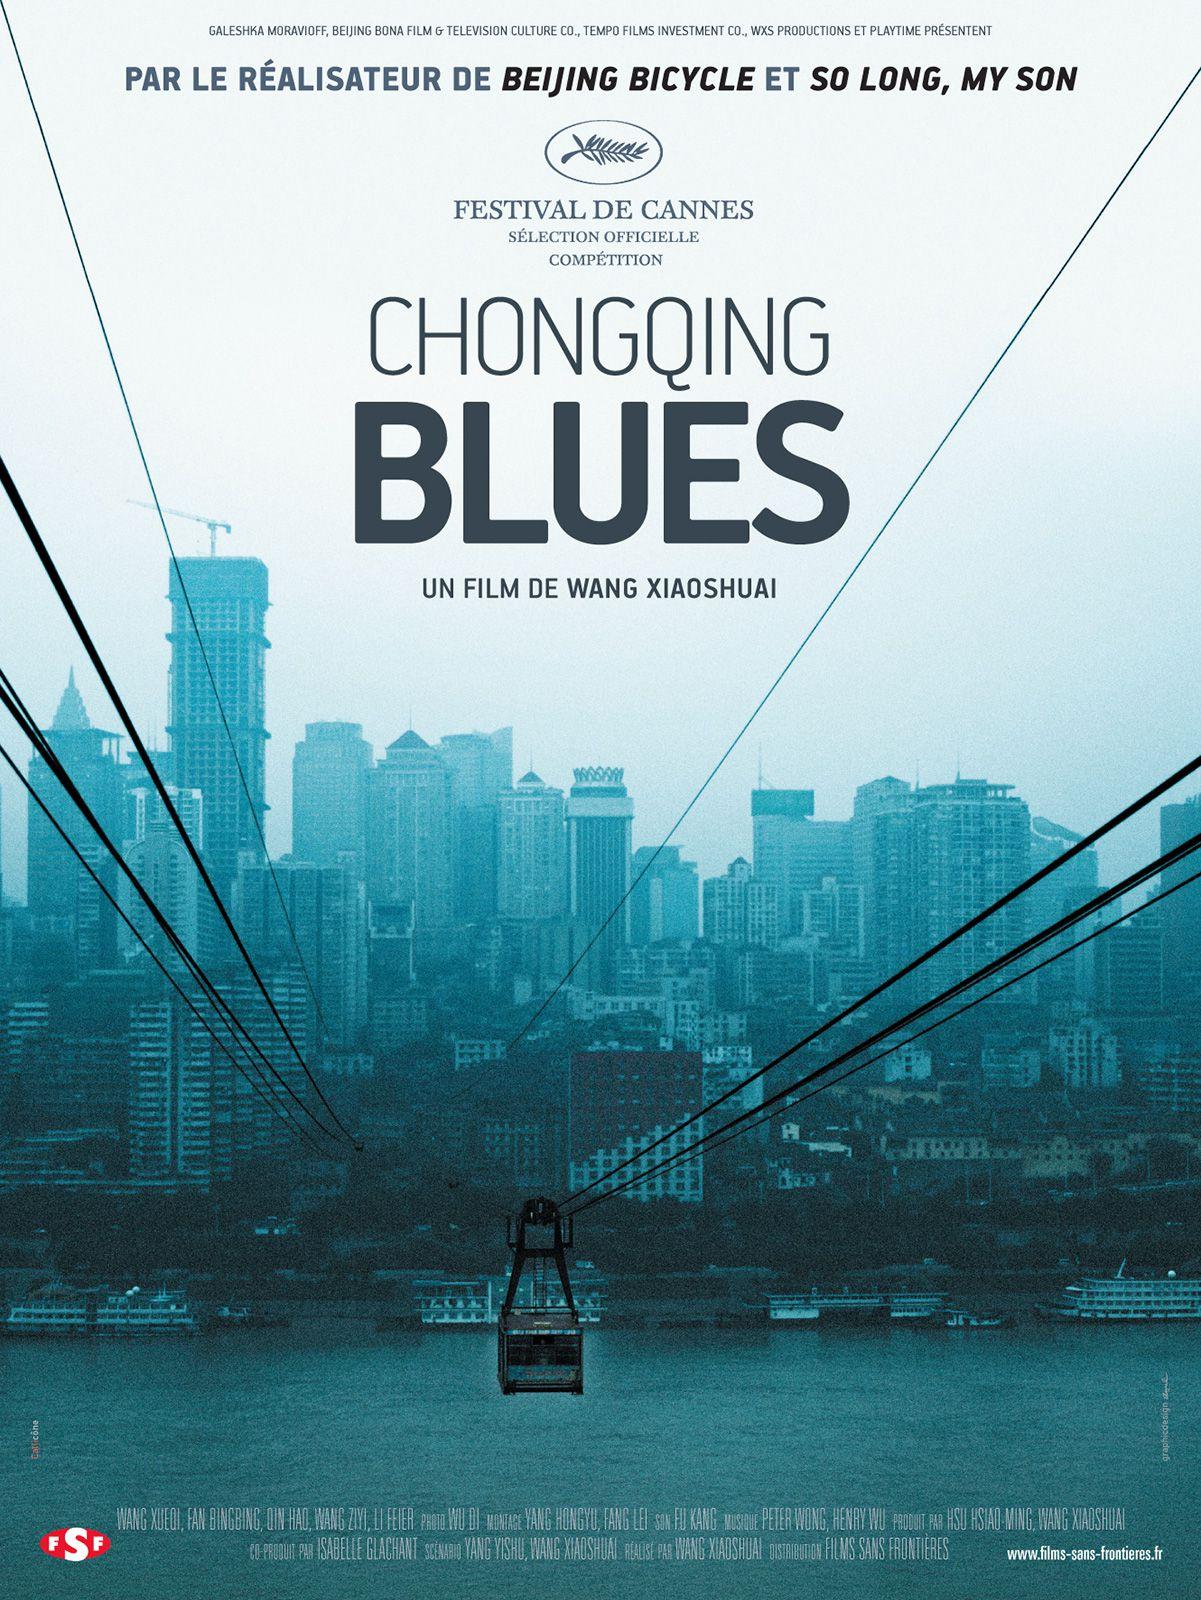 Chongqing Blues - Film (2010)